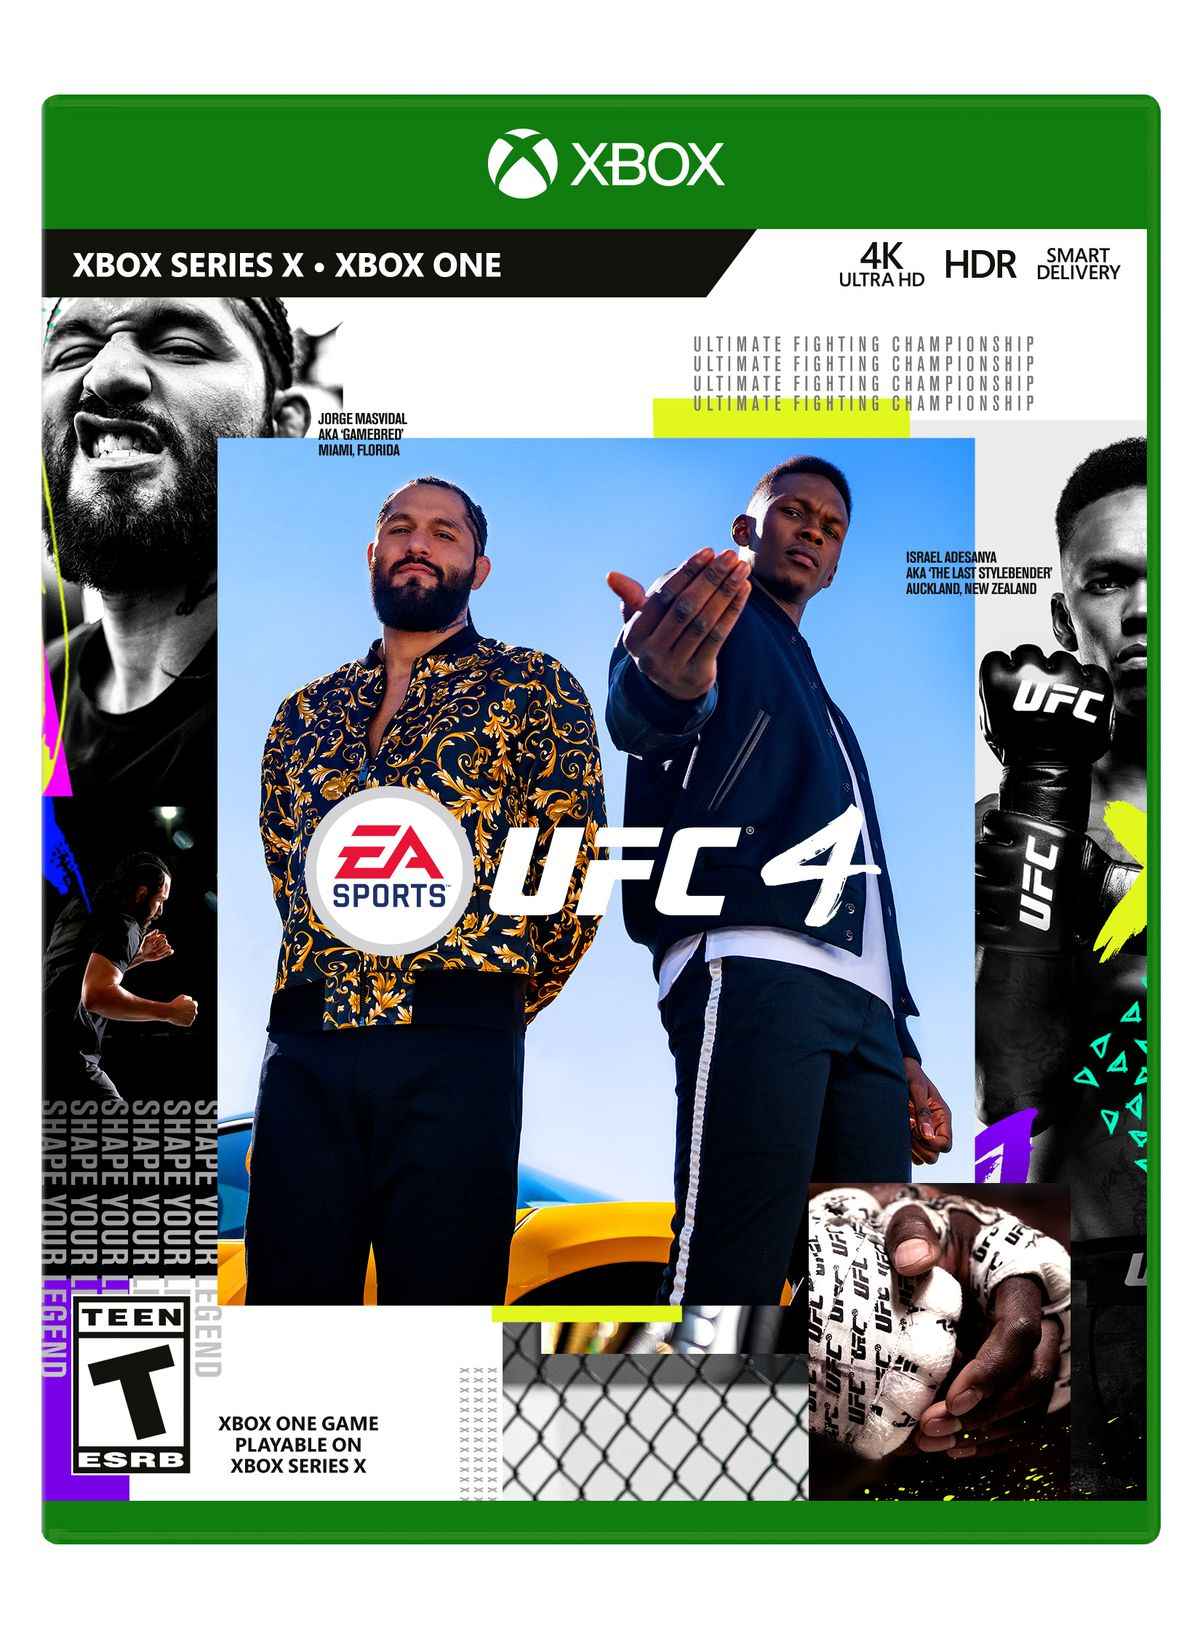 the Xbox One Box Art for EA Sports UFC 4 with Jorge Masvidal and Israel Adesanya